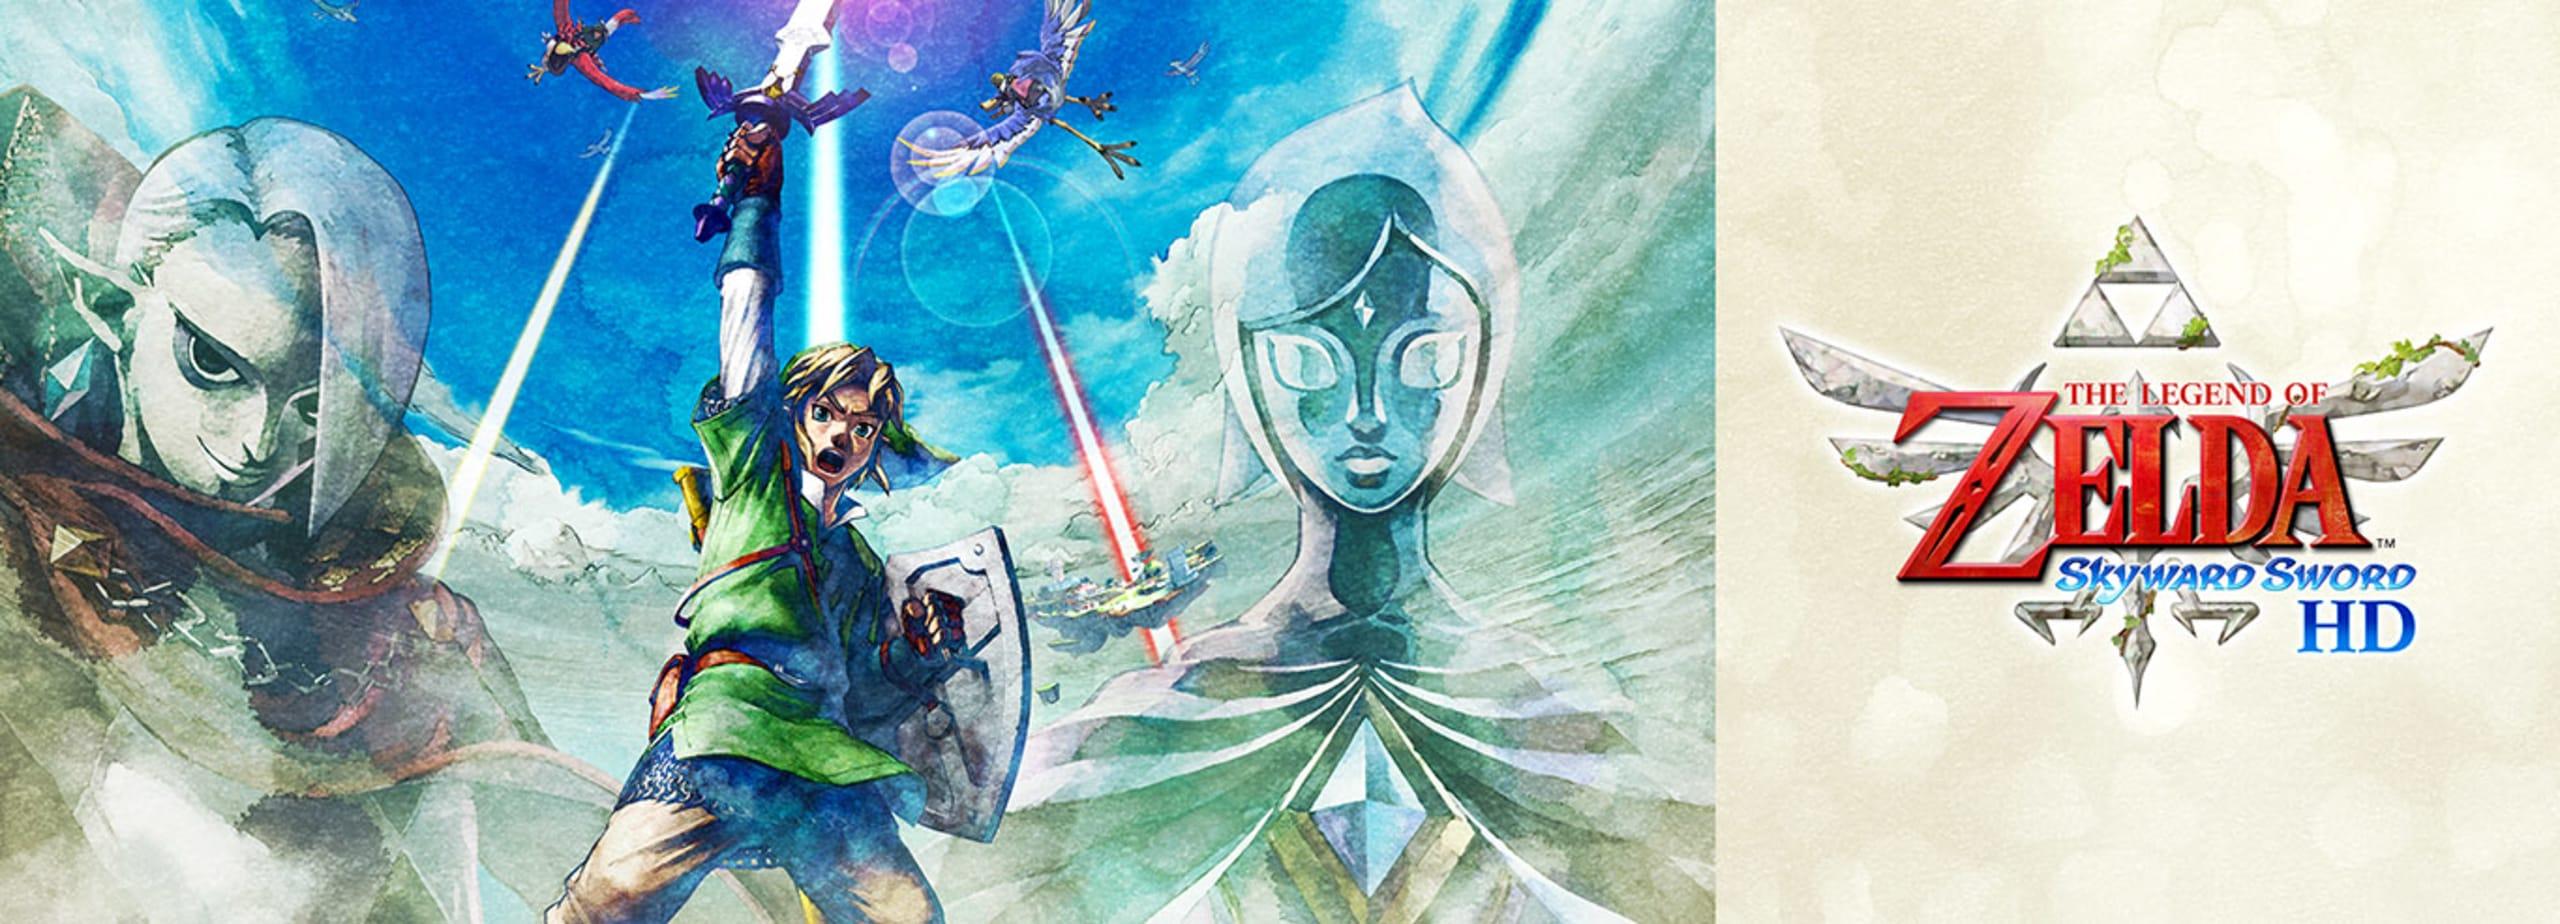 The Legend of Zelda: Skyward Sword HD - Já disponível